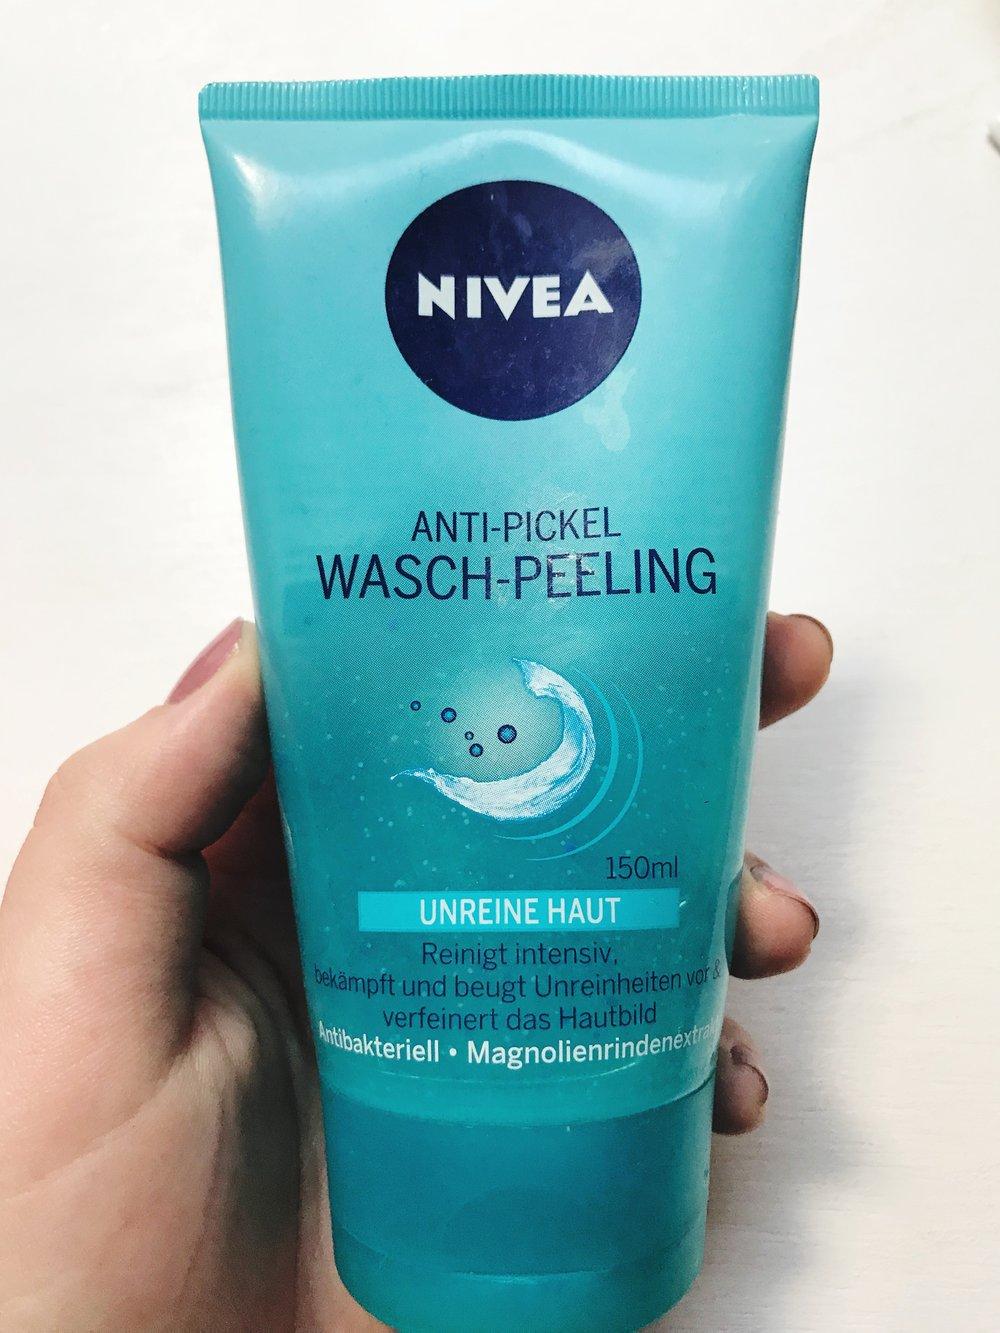 Nivea-Wasch-Haut.JPG